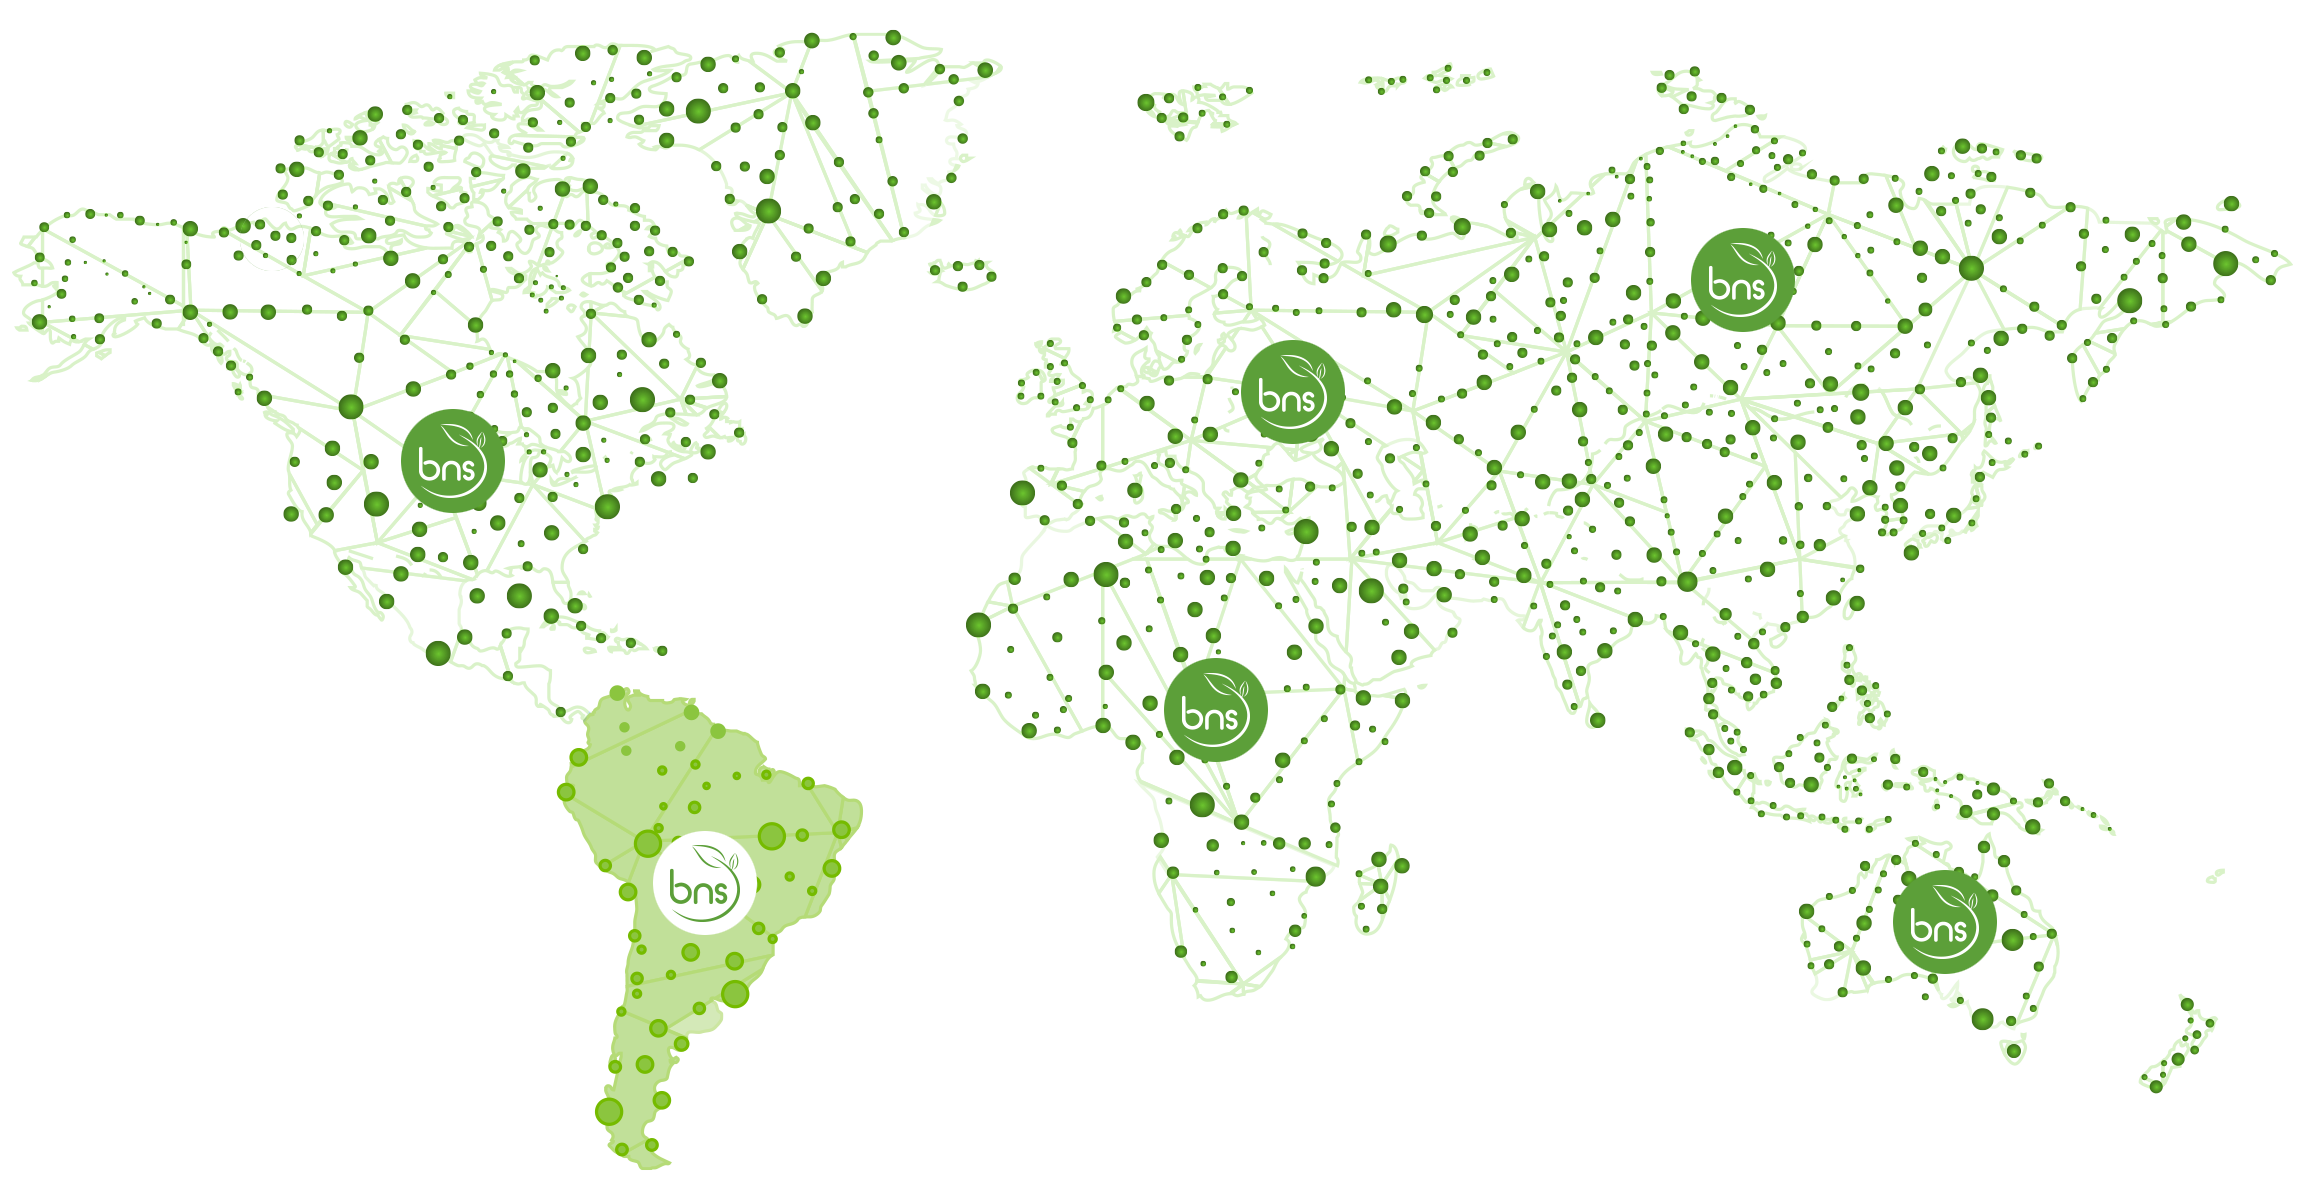 bg-map-bns